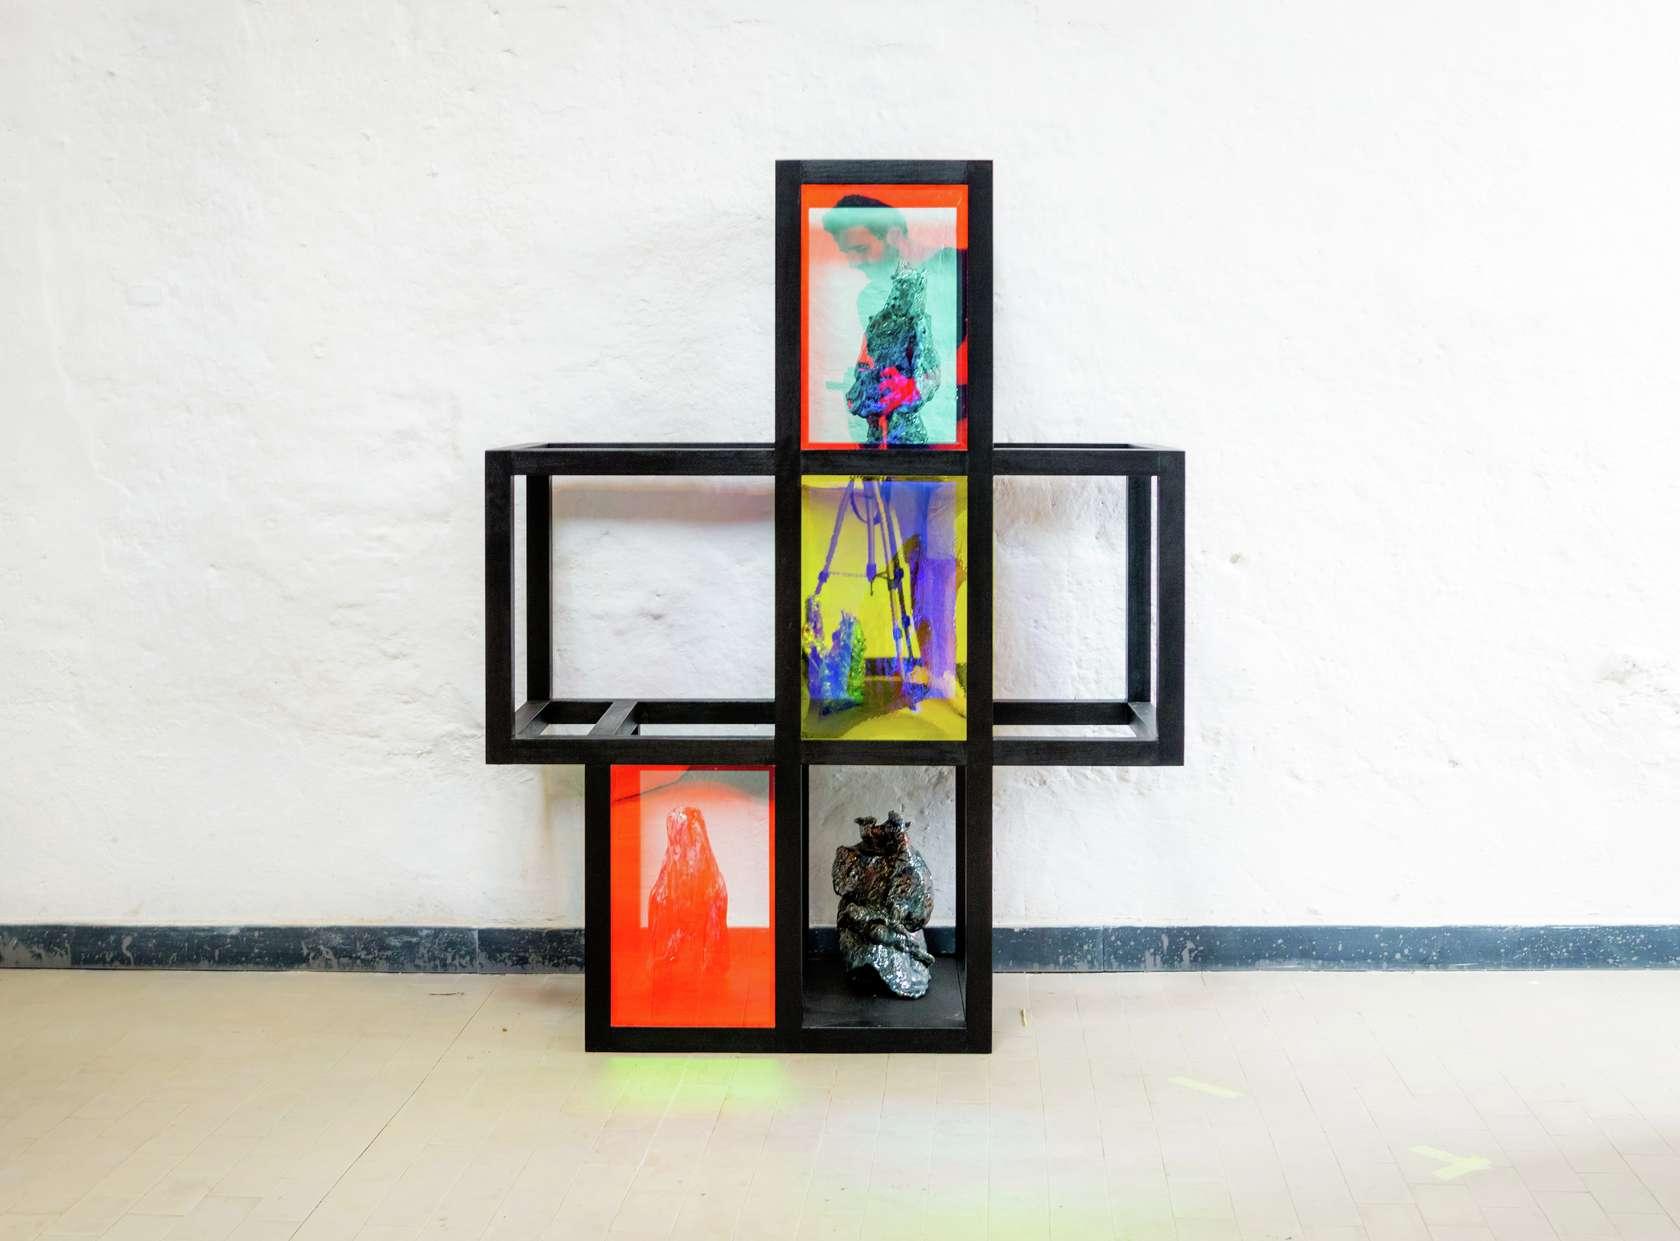 Salvatore Arancio, Like a Sort of Pompeii in Reverse, (Cabinet III), 2019 Structure en bois peint, filtres dichroïques et quatre céramiques136 x 106 x 38 cm / 53 1/2 x 41 6/8 x 15  inches